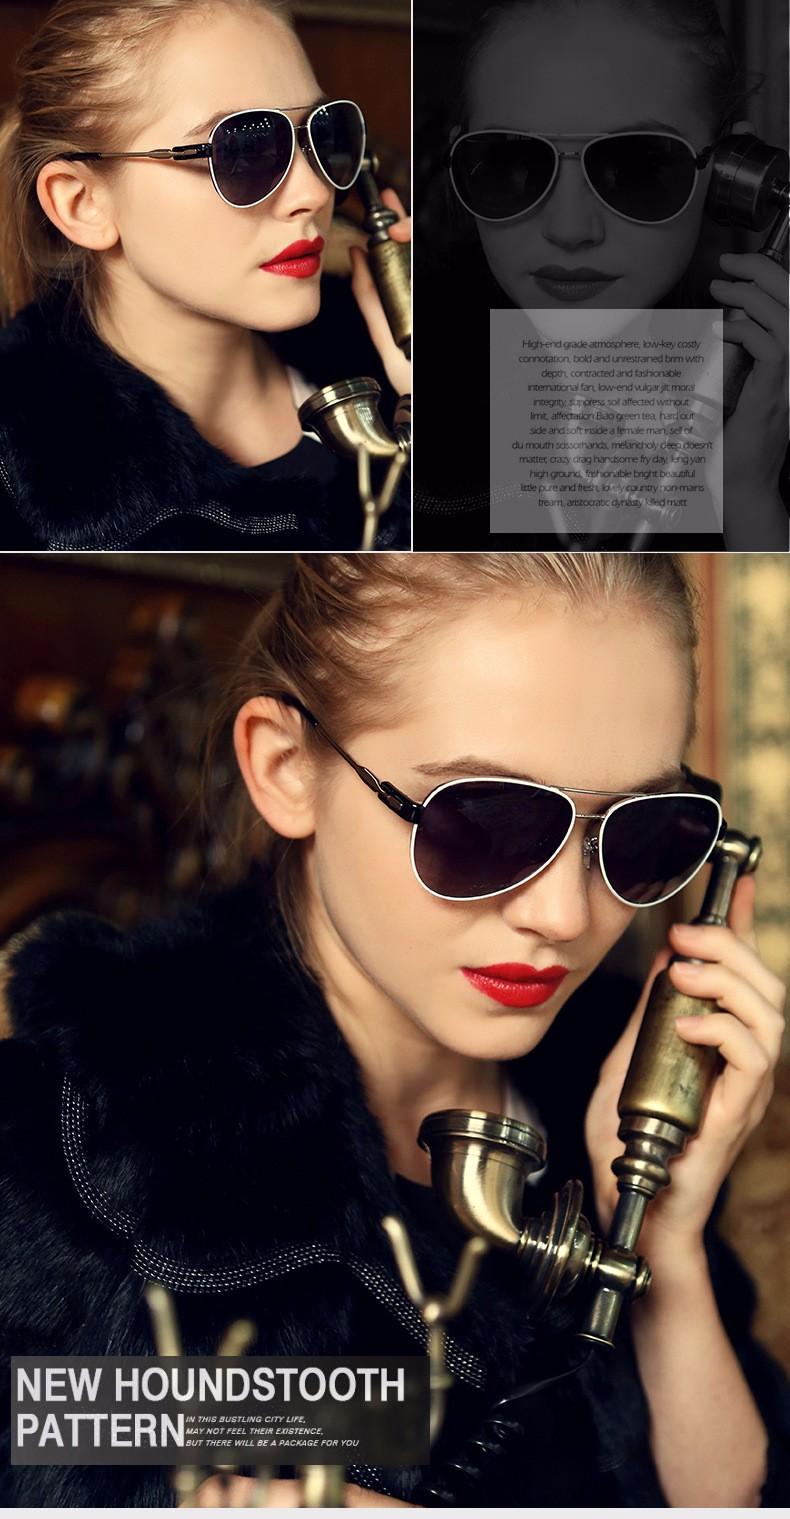 2017 ladies Polarized Sunglasses google vintage/retro sunglasses for women original brand designer female with logo sunglasses